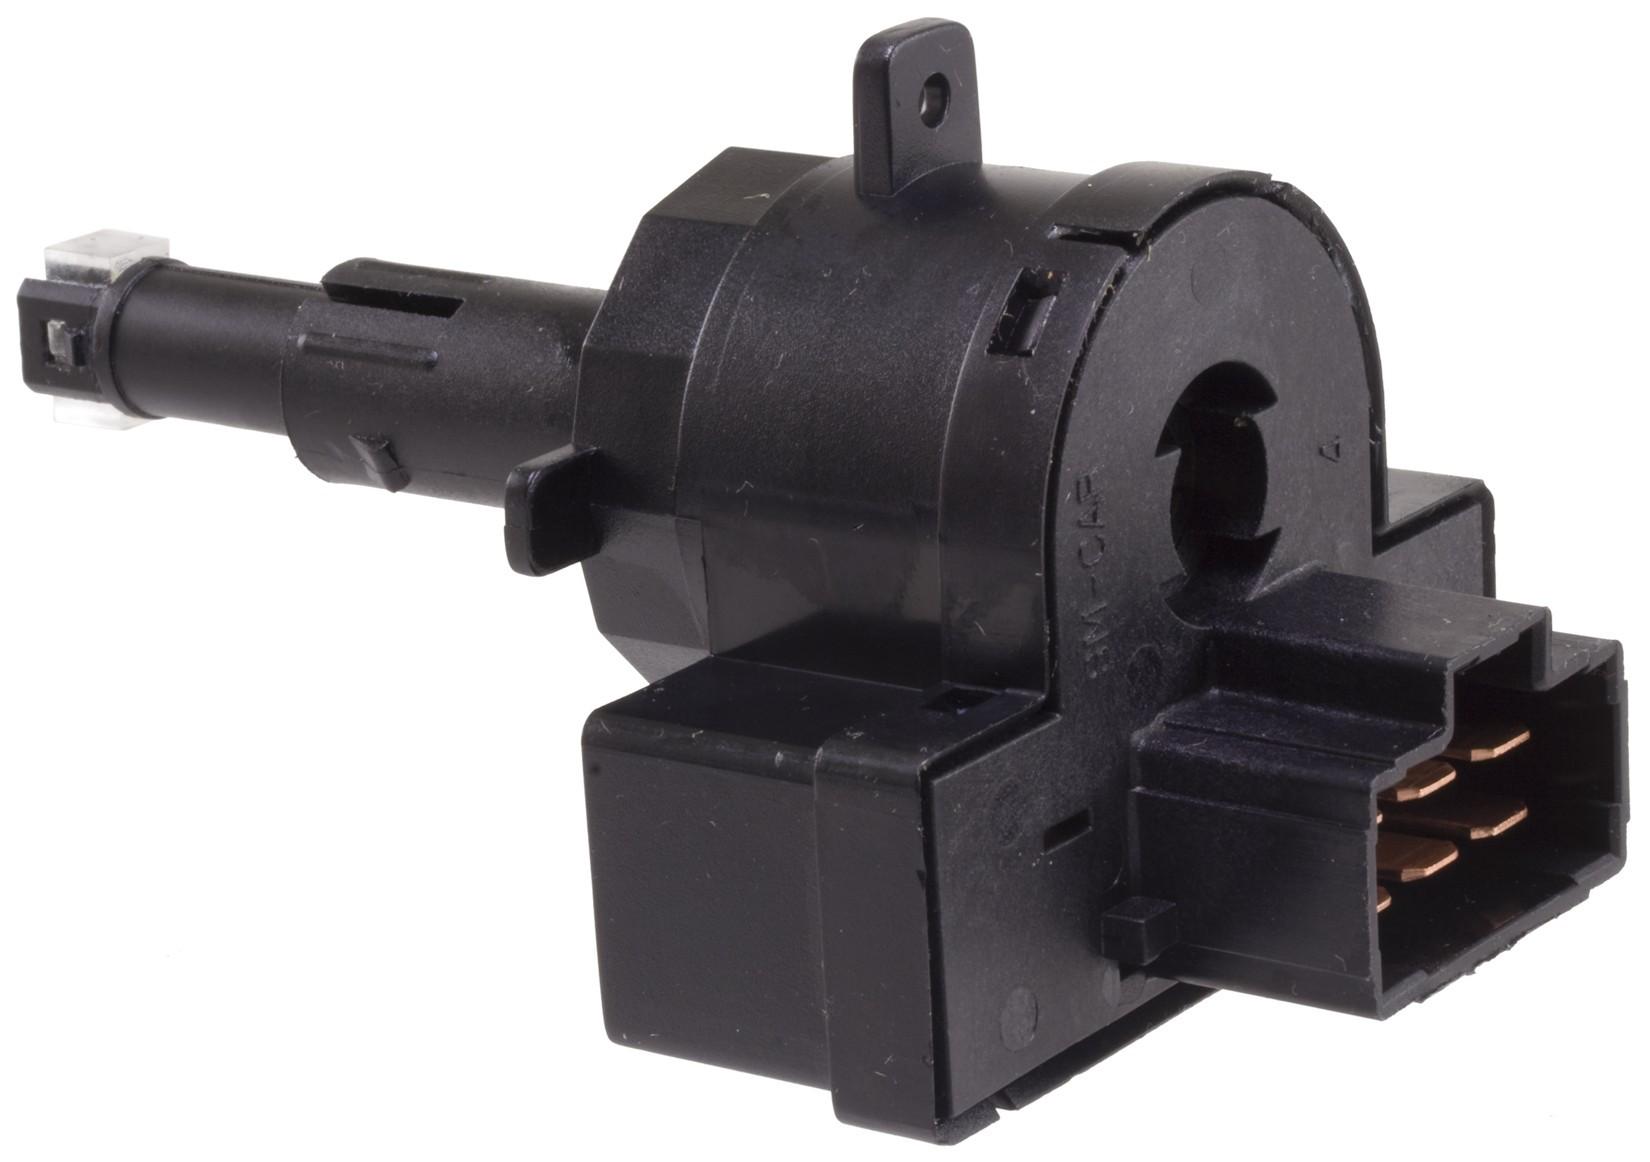 hvac blower control switch airtex 1s8909 fits 03 06. Black Bedroom Furniture Sets. Home Design Ideas